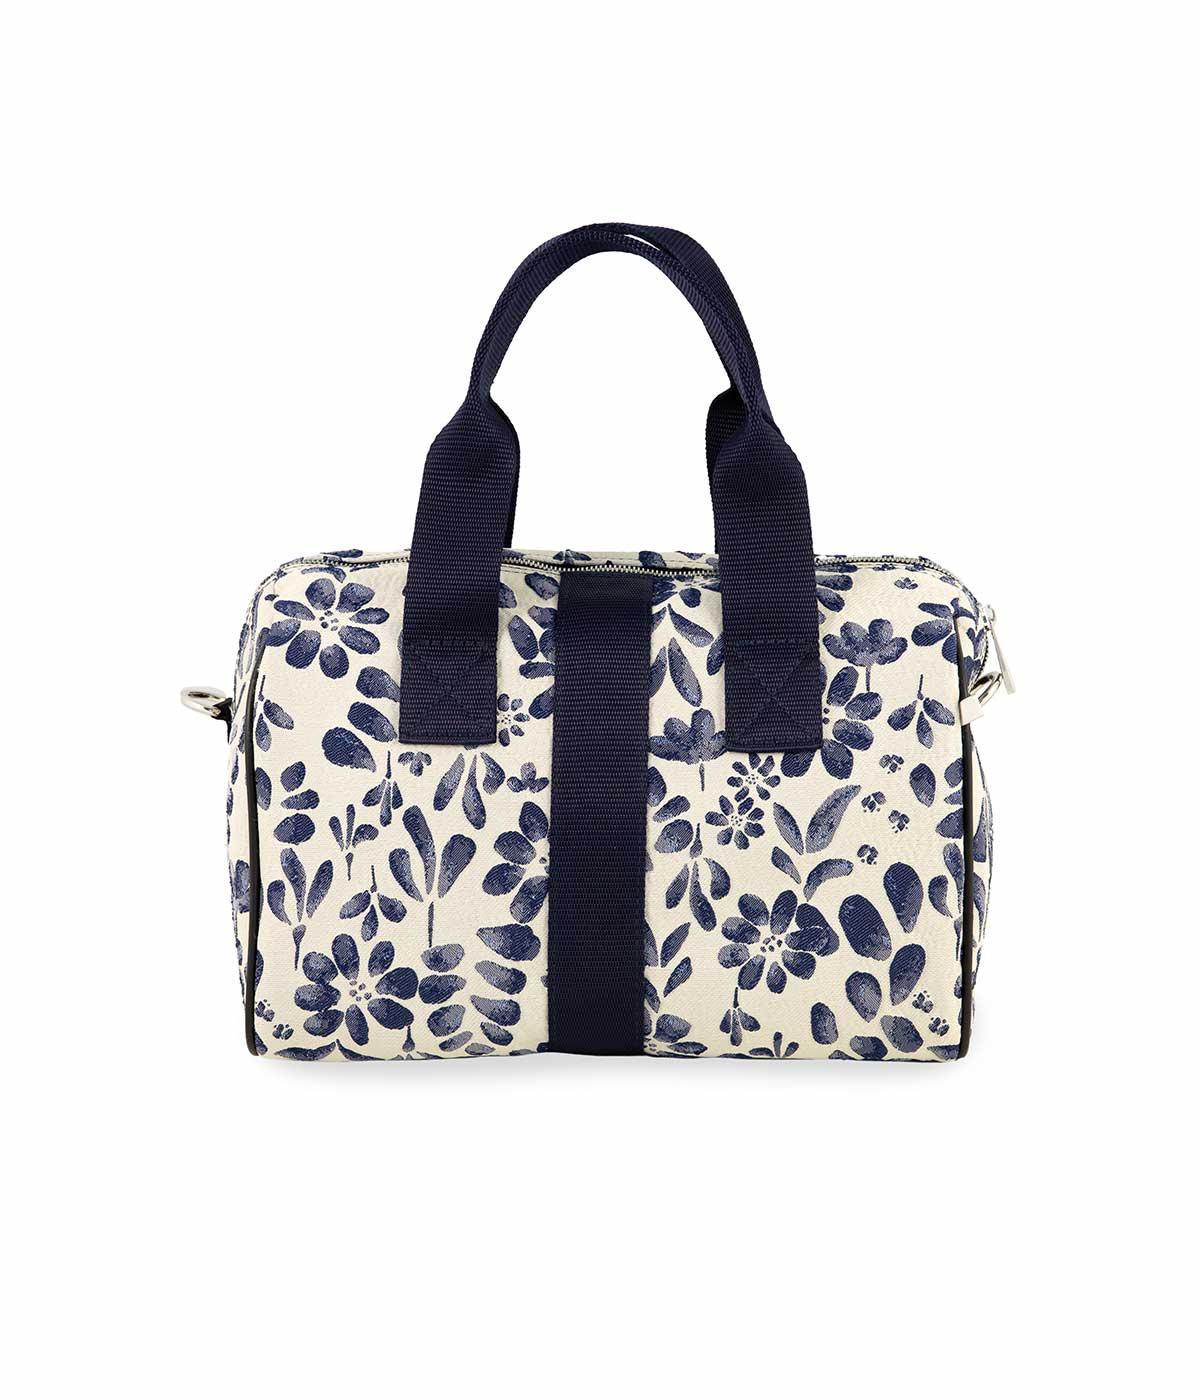 Bauletto Tessuto Damascato Floreale Bianco Blu Quitto Bags